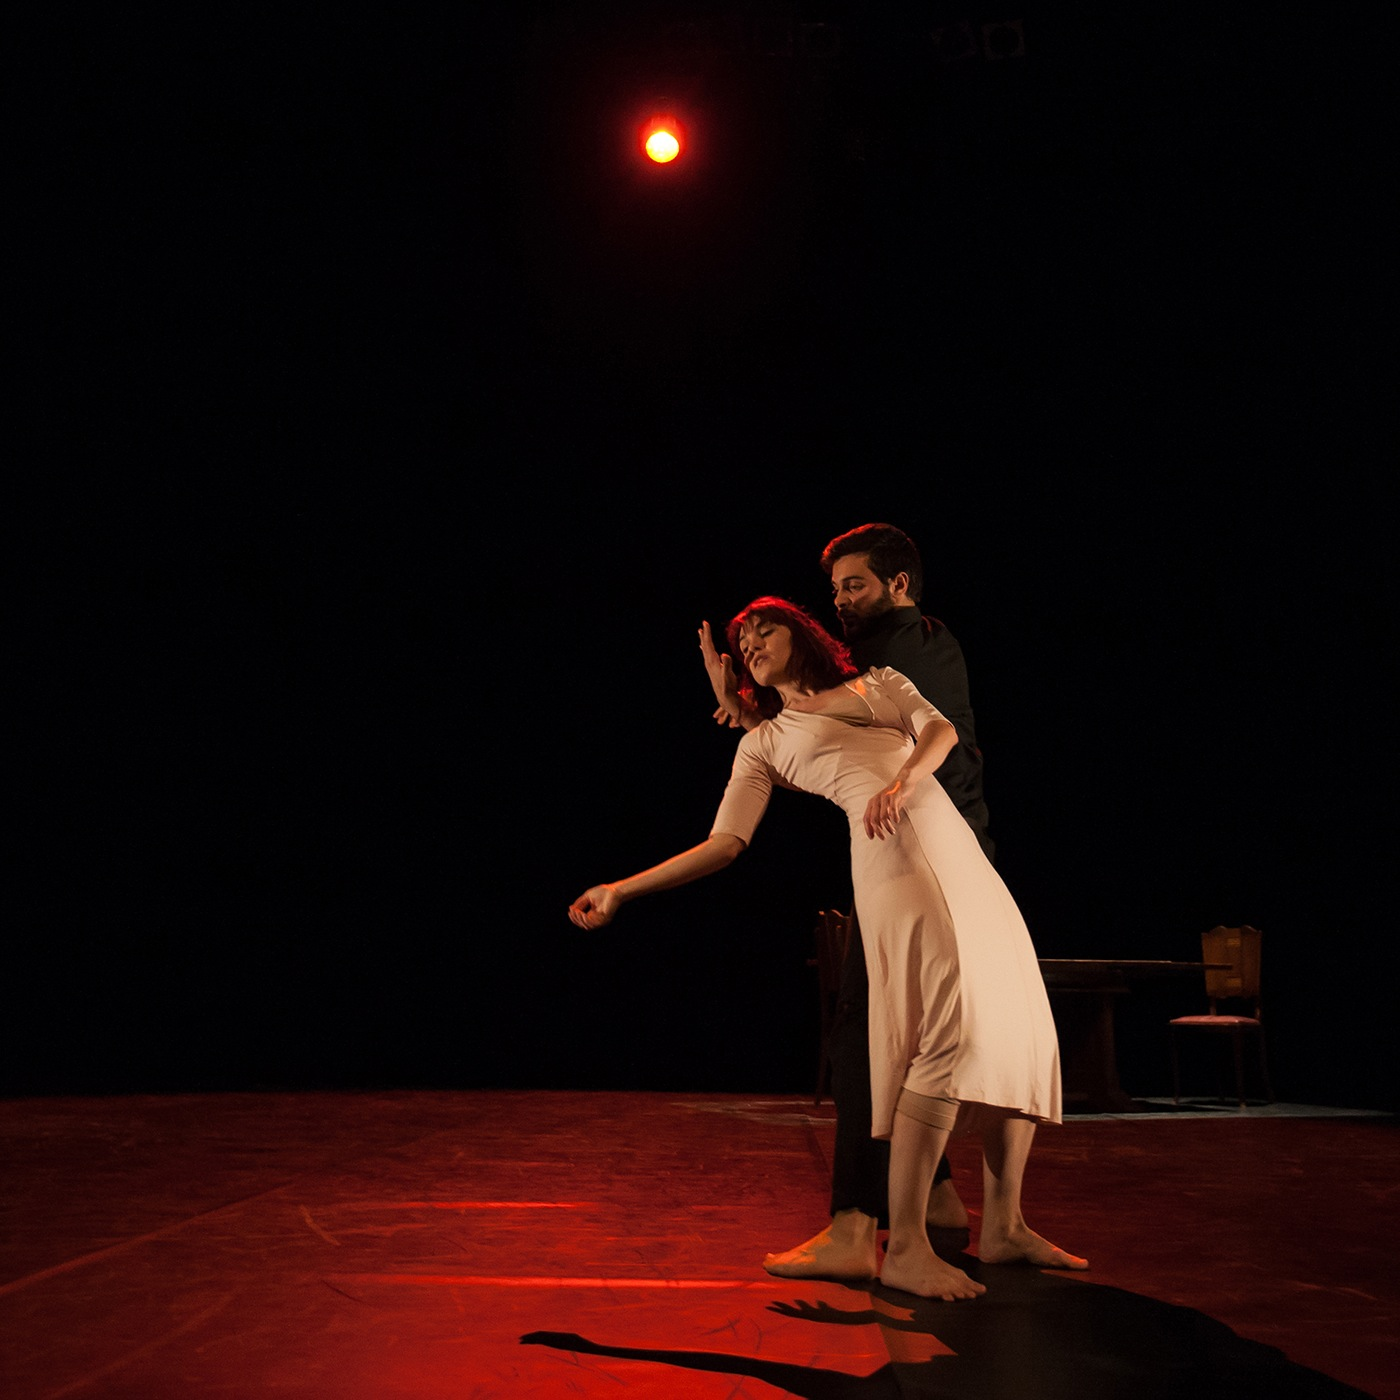 photographe-reportage-danse-avec-ton-crous-guillaume-heraud-014-small